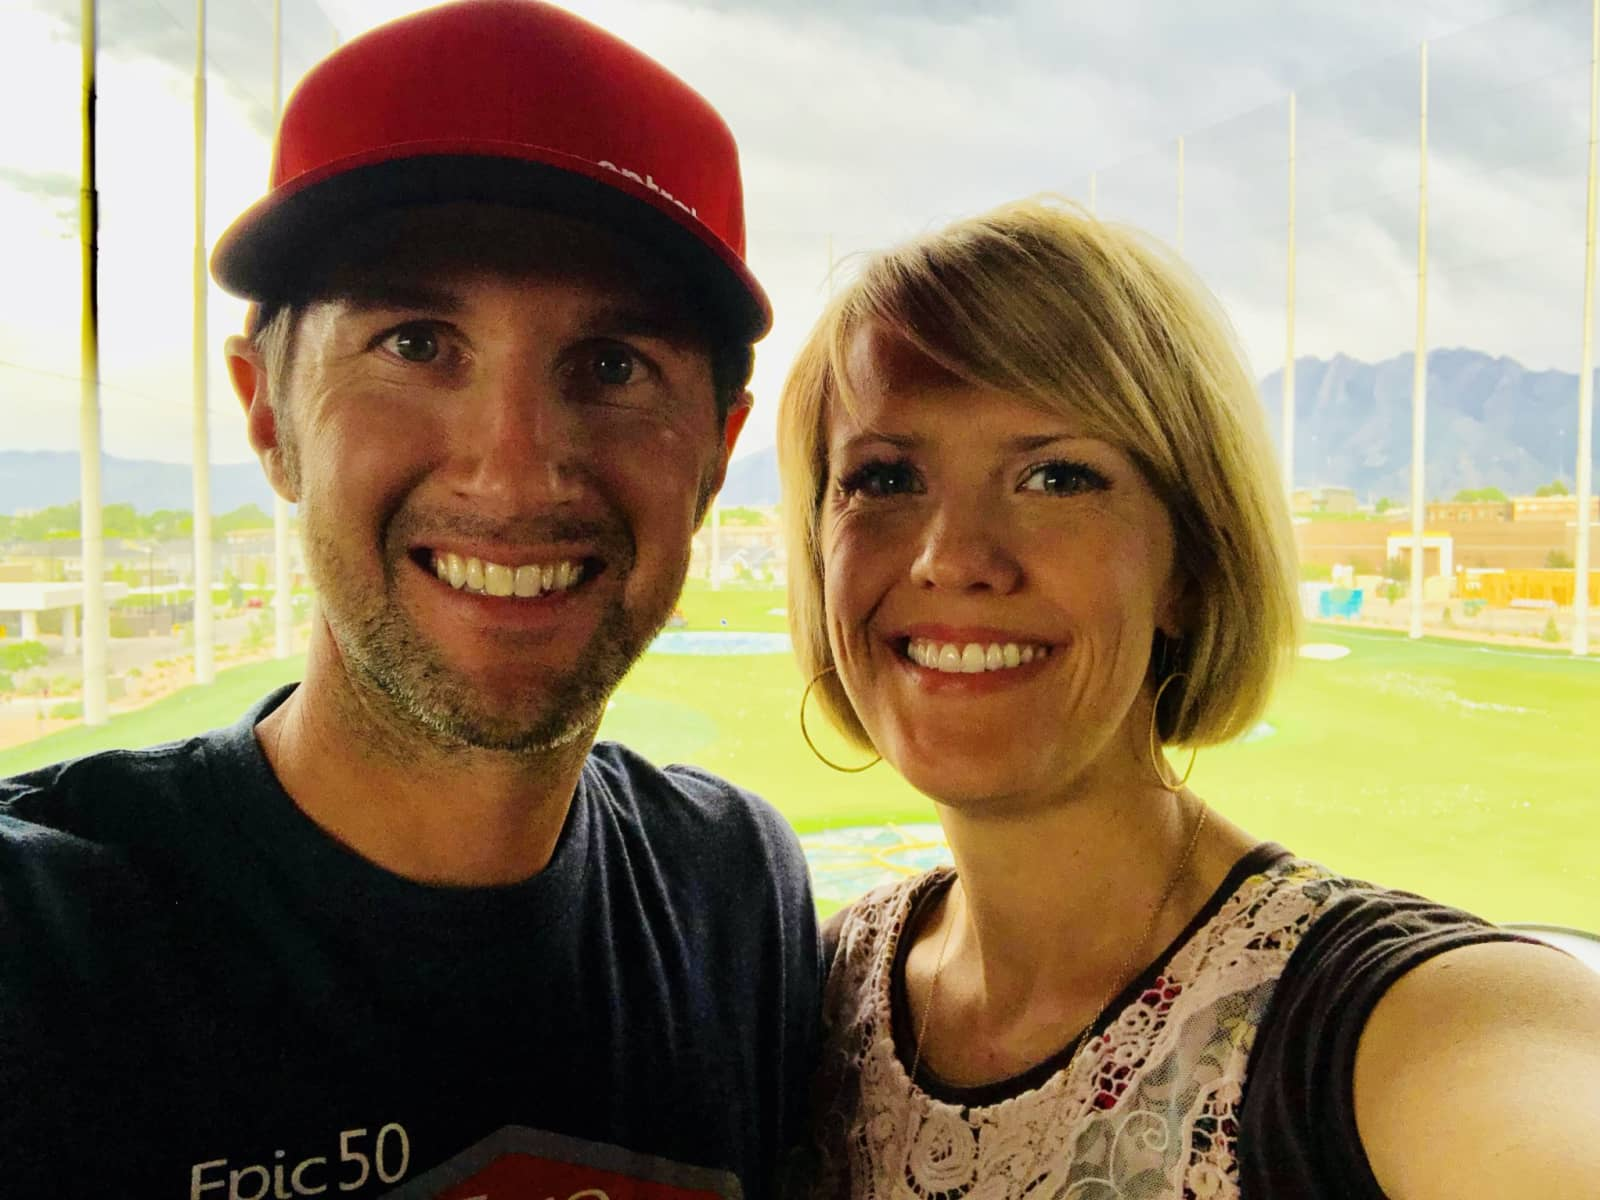 Abbey&greg & Greg from Salt Lake City, Utah, United States